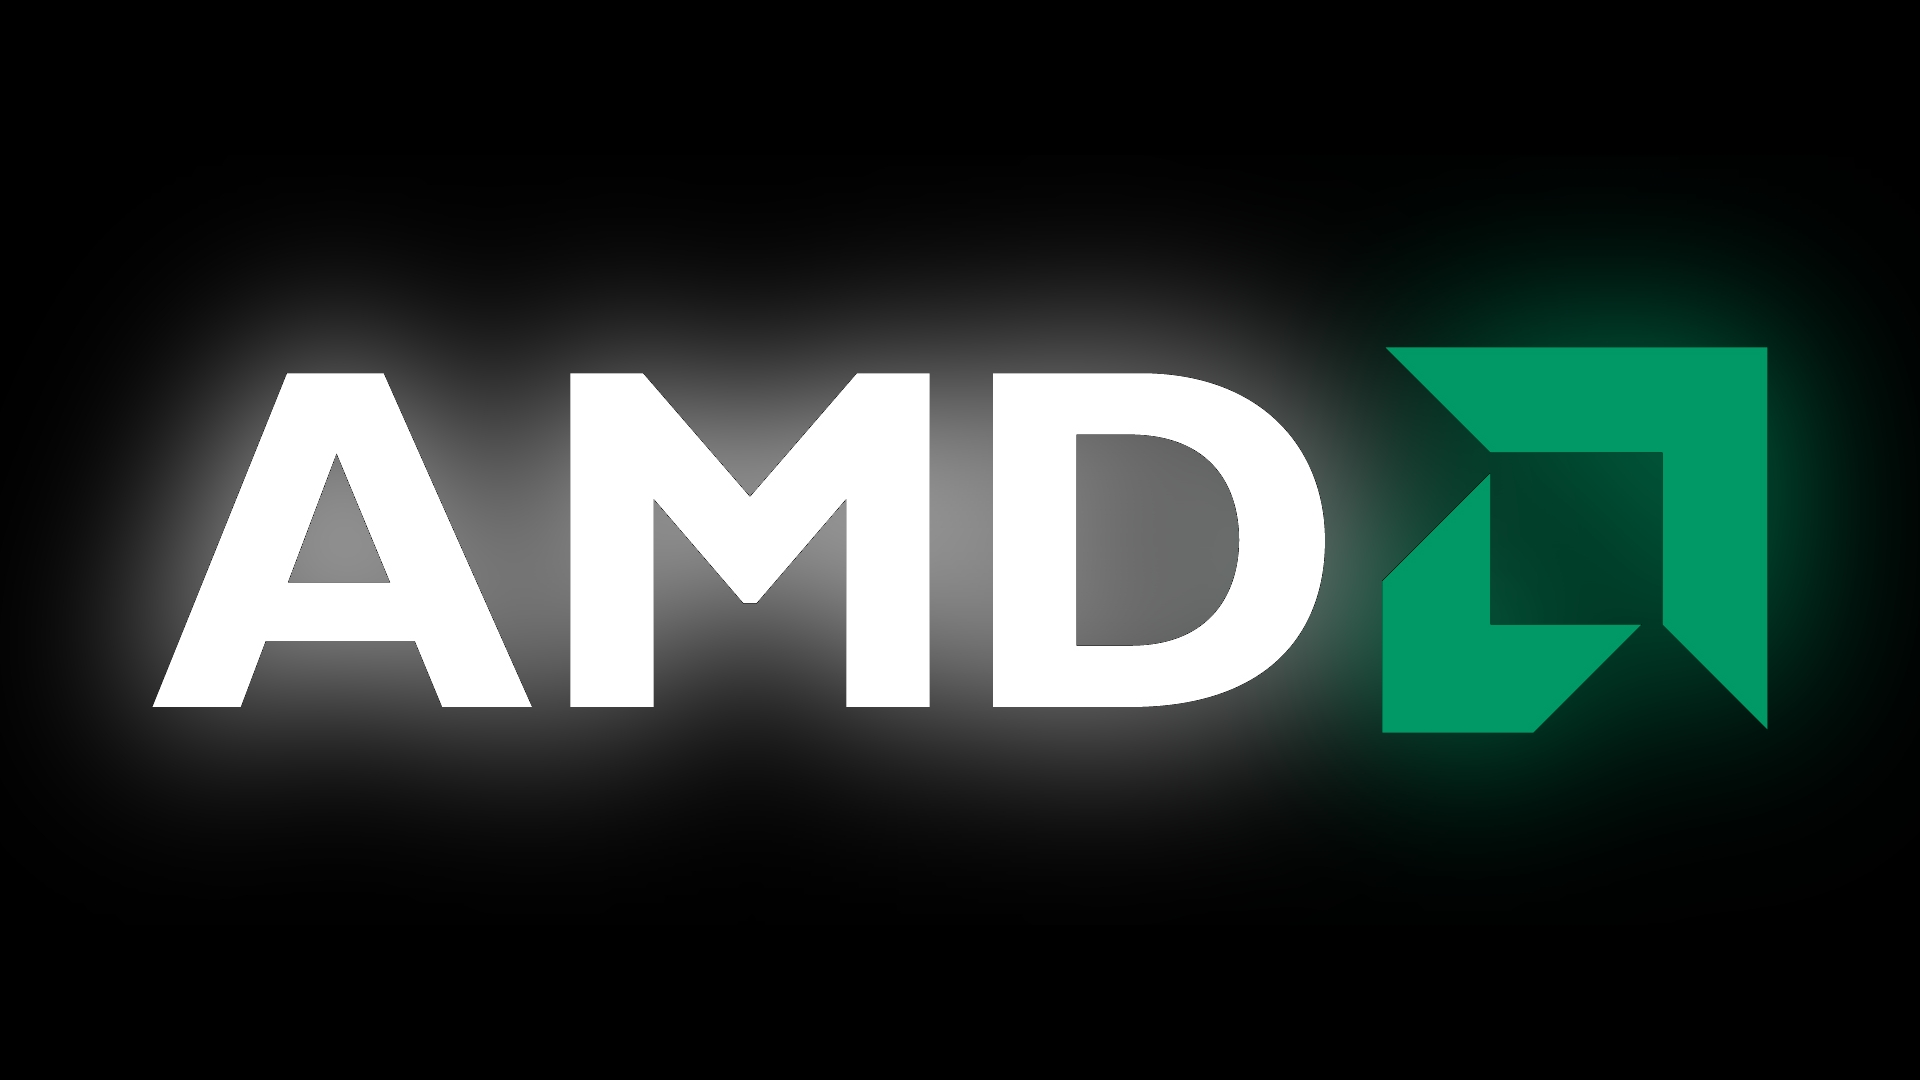 AMD - Bing images